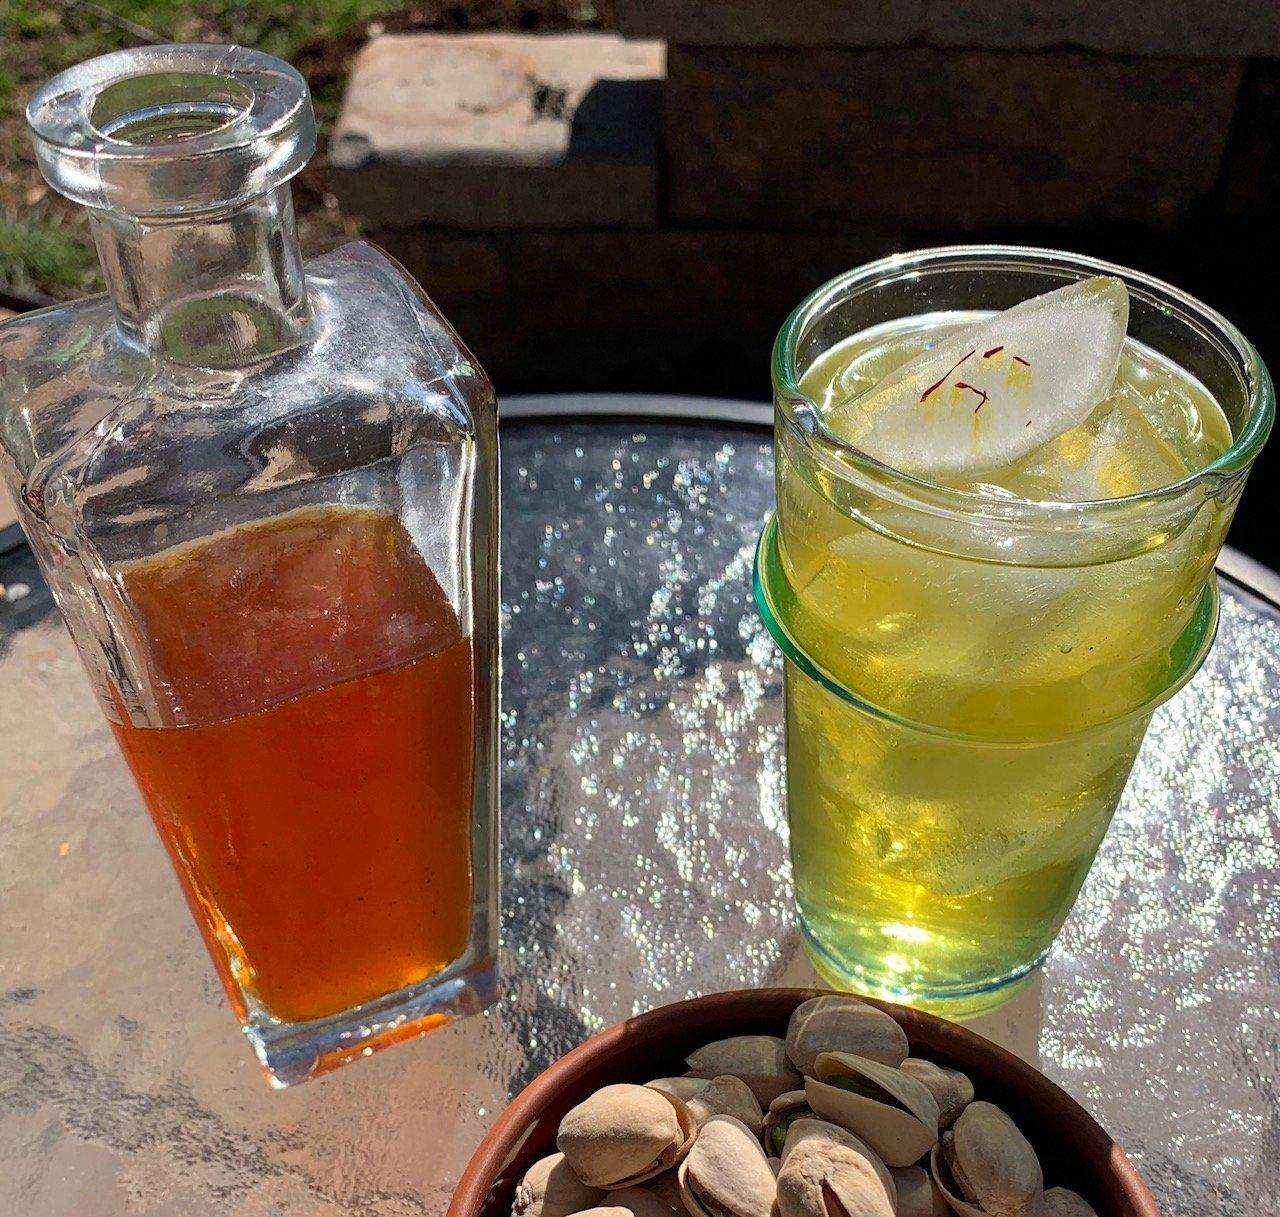 Sumac and Saffron Spritzer